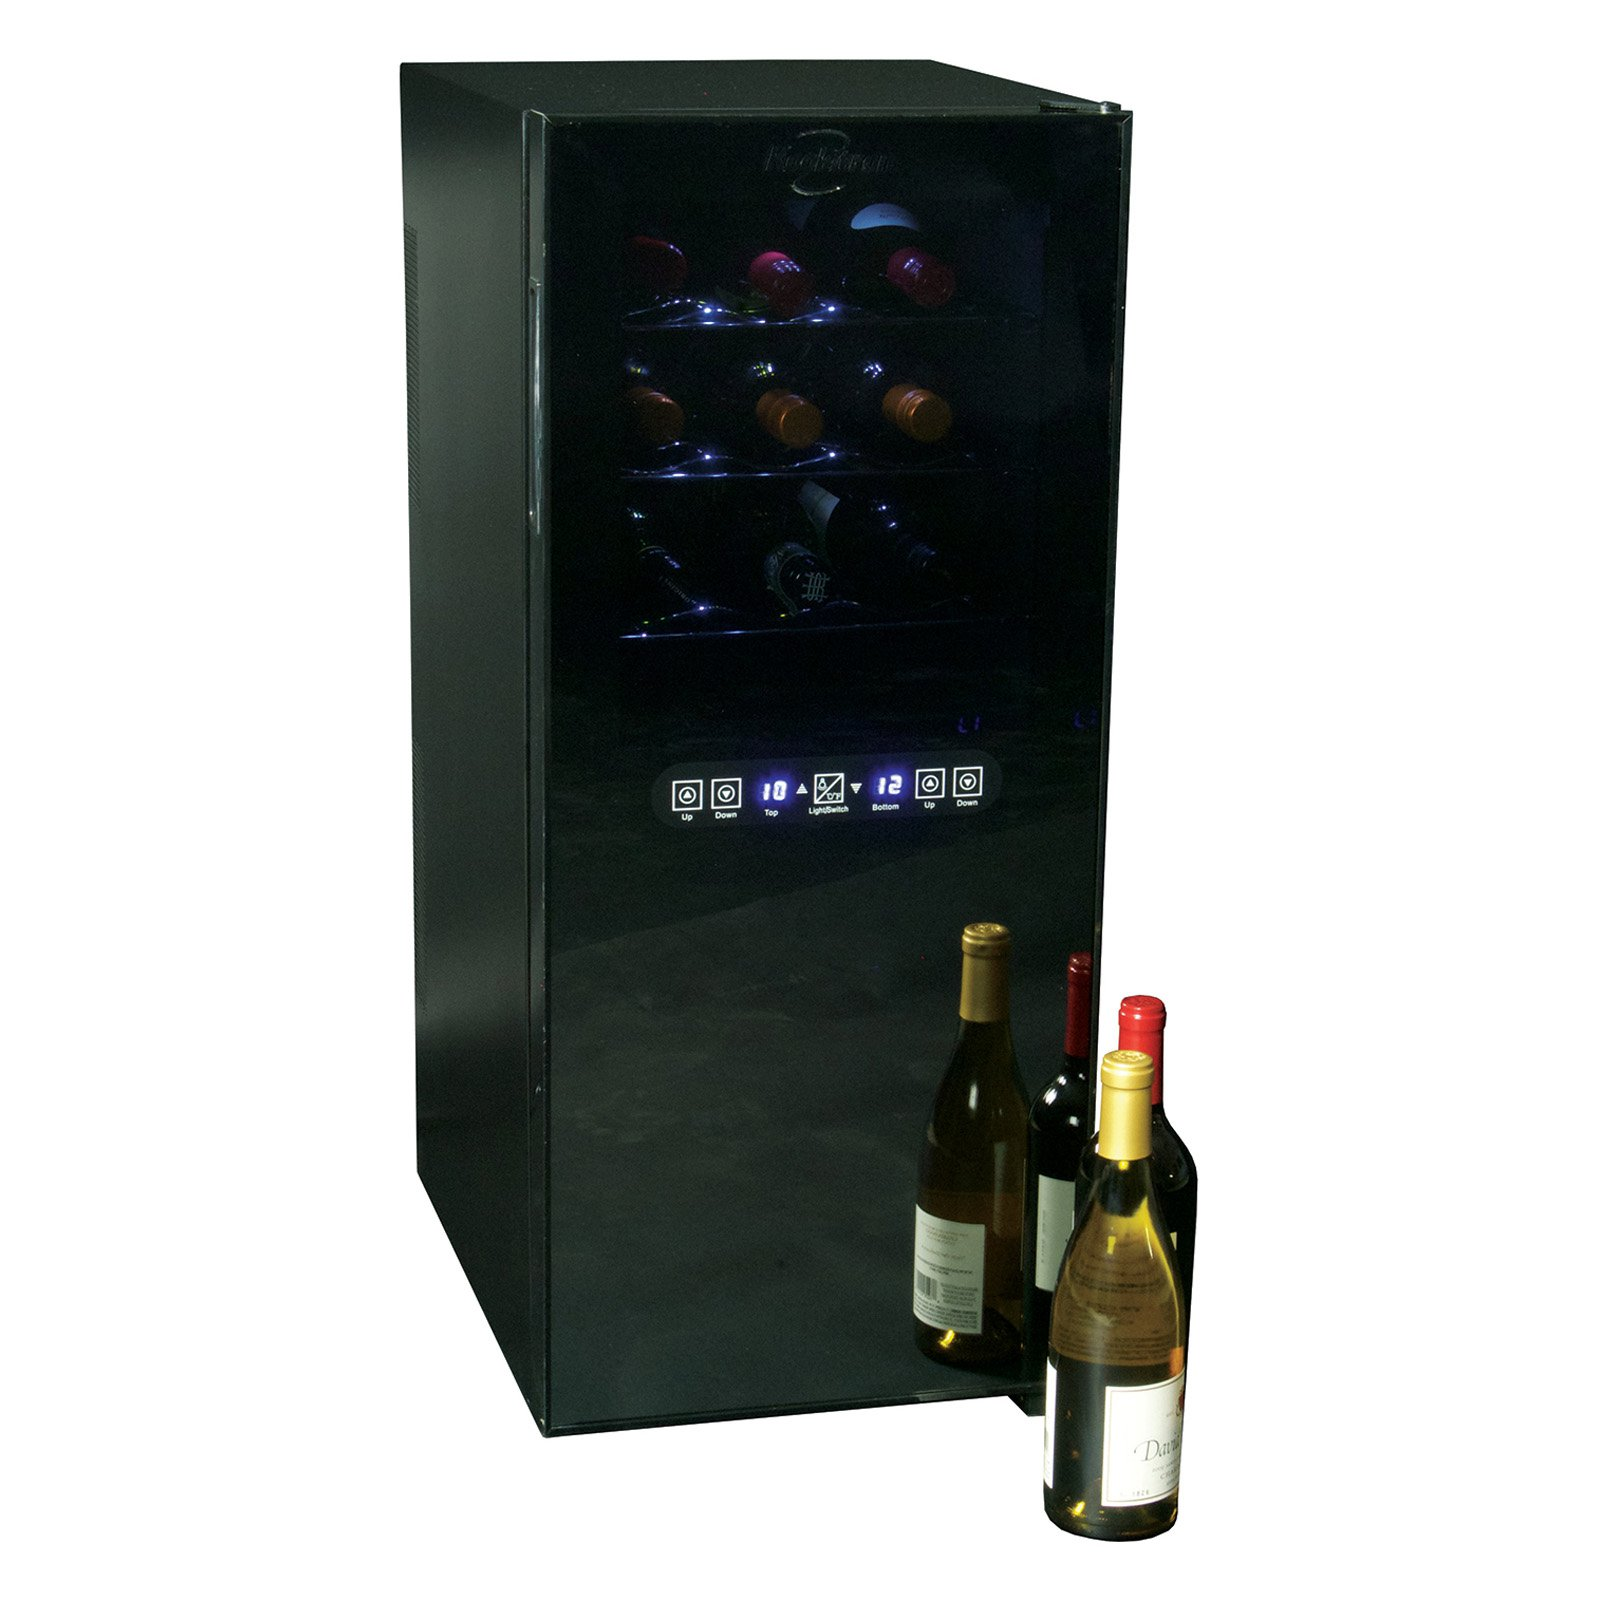 Koolatron WC24MG 24-Bottle Dual-Zone Wine Cooler